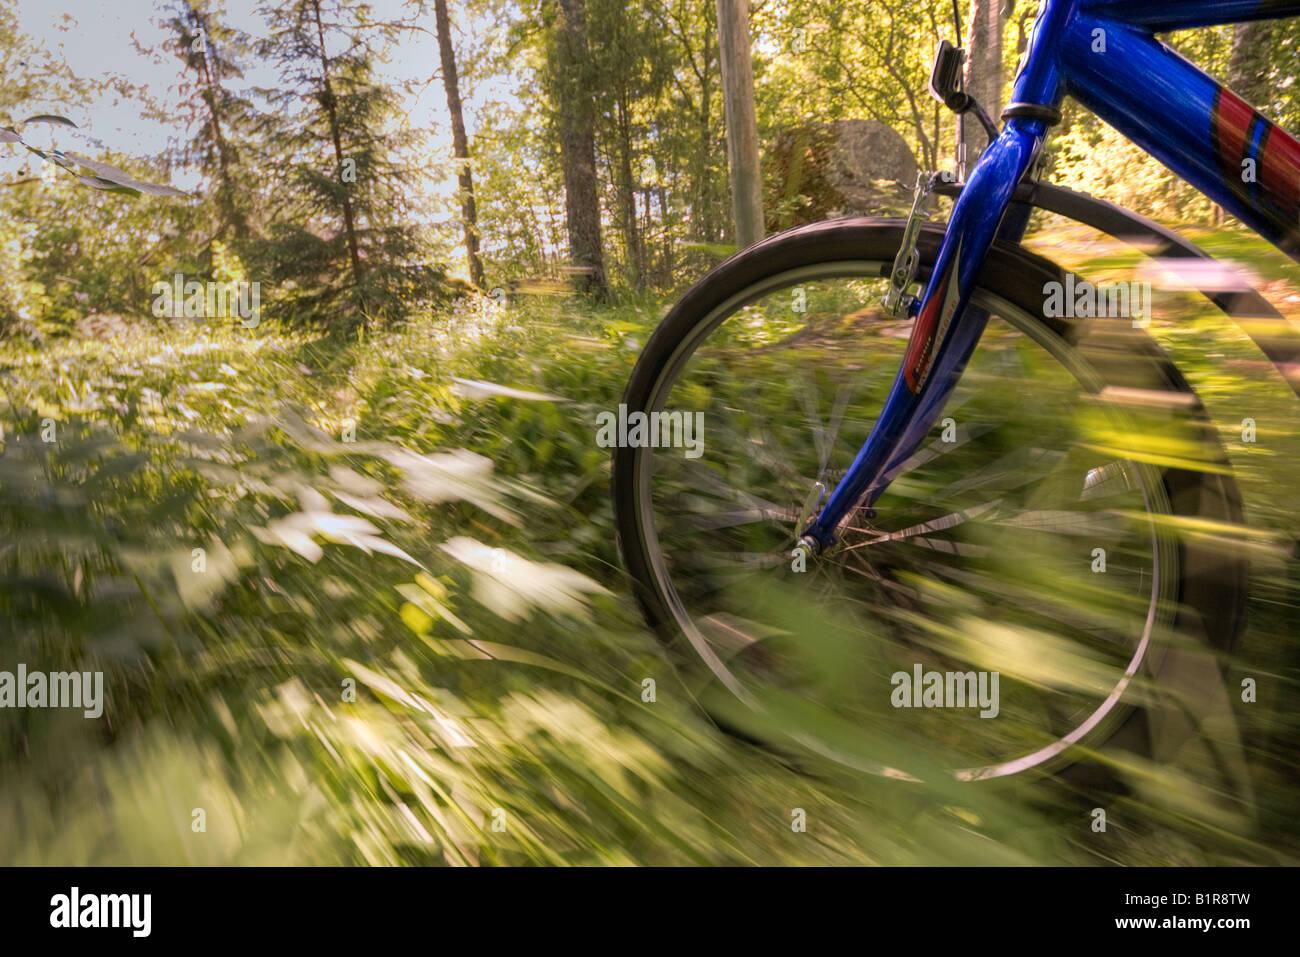 Off-road biking - Stock Image